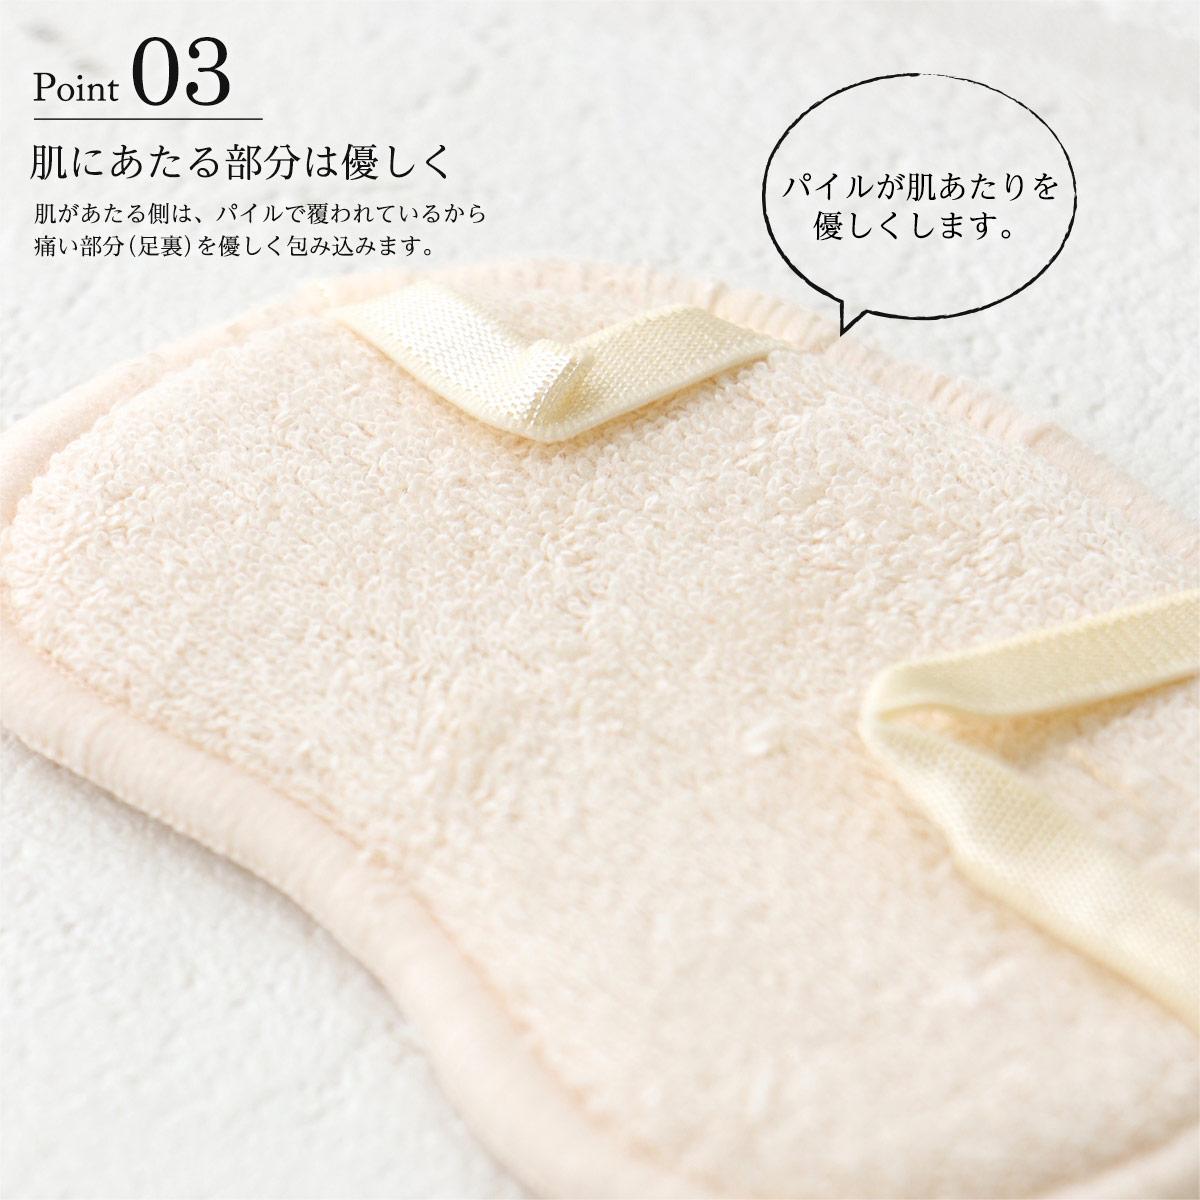 NAIGAI COMFORT ナイガイ コンフォート 肌側パイル 綿混足底クッション   ナイガイ製 すべり止め付 レッグソリューション 3070-014【ゆうパケット・4点まで】